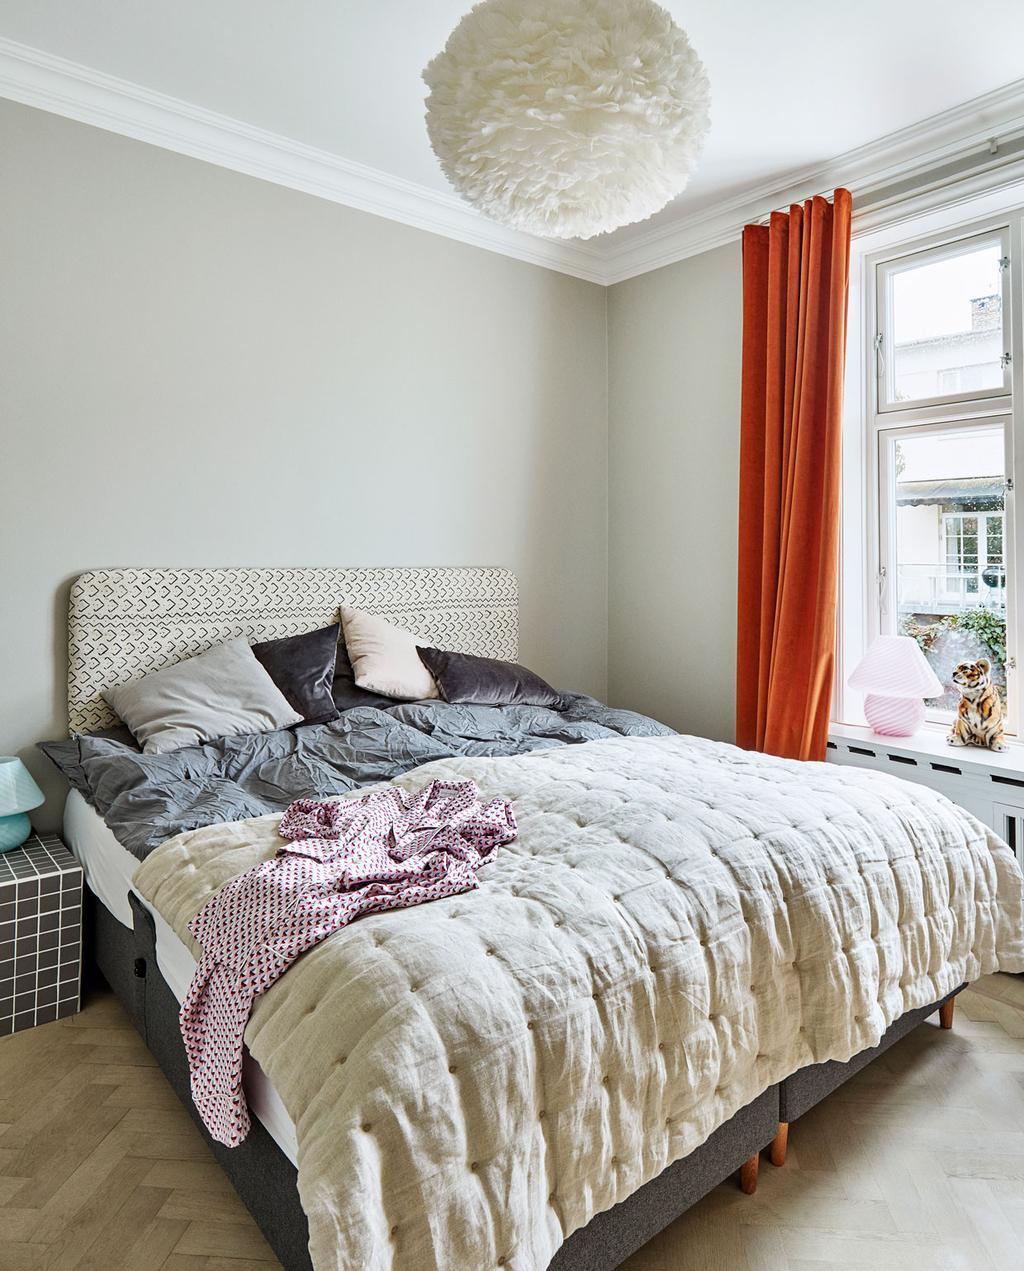 vtwonen 10-2019 | slaapkamer oranje gordijnen